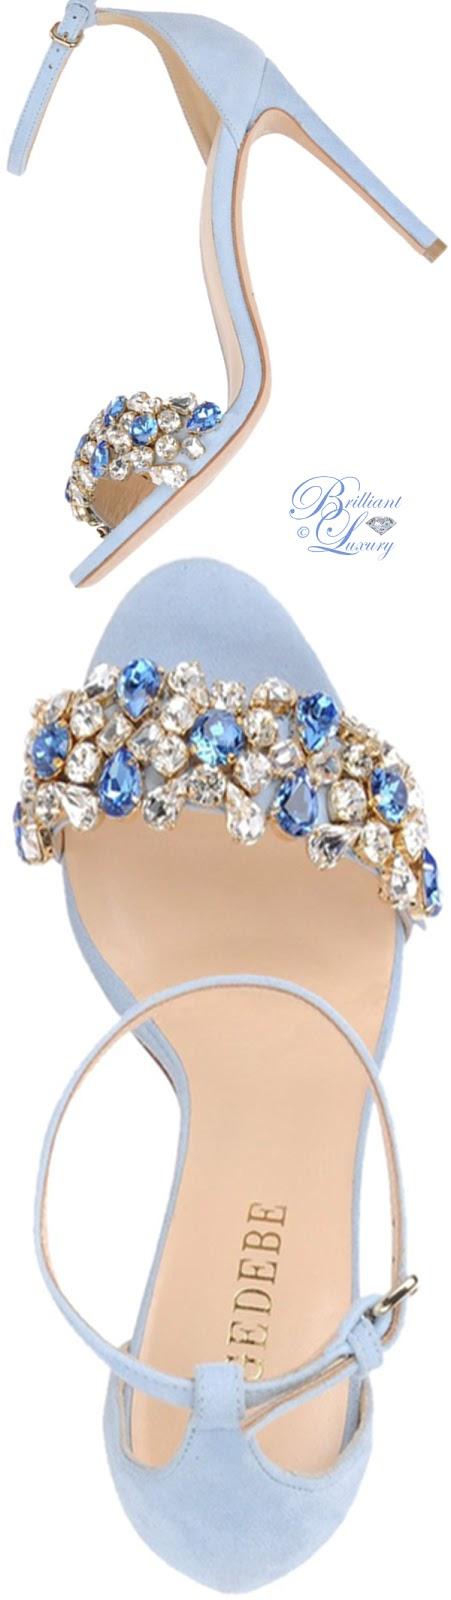 Brilliant Luxury ♦ Gedebe sandals